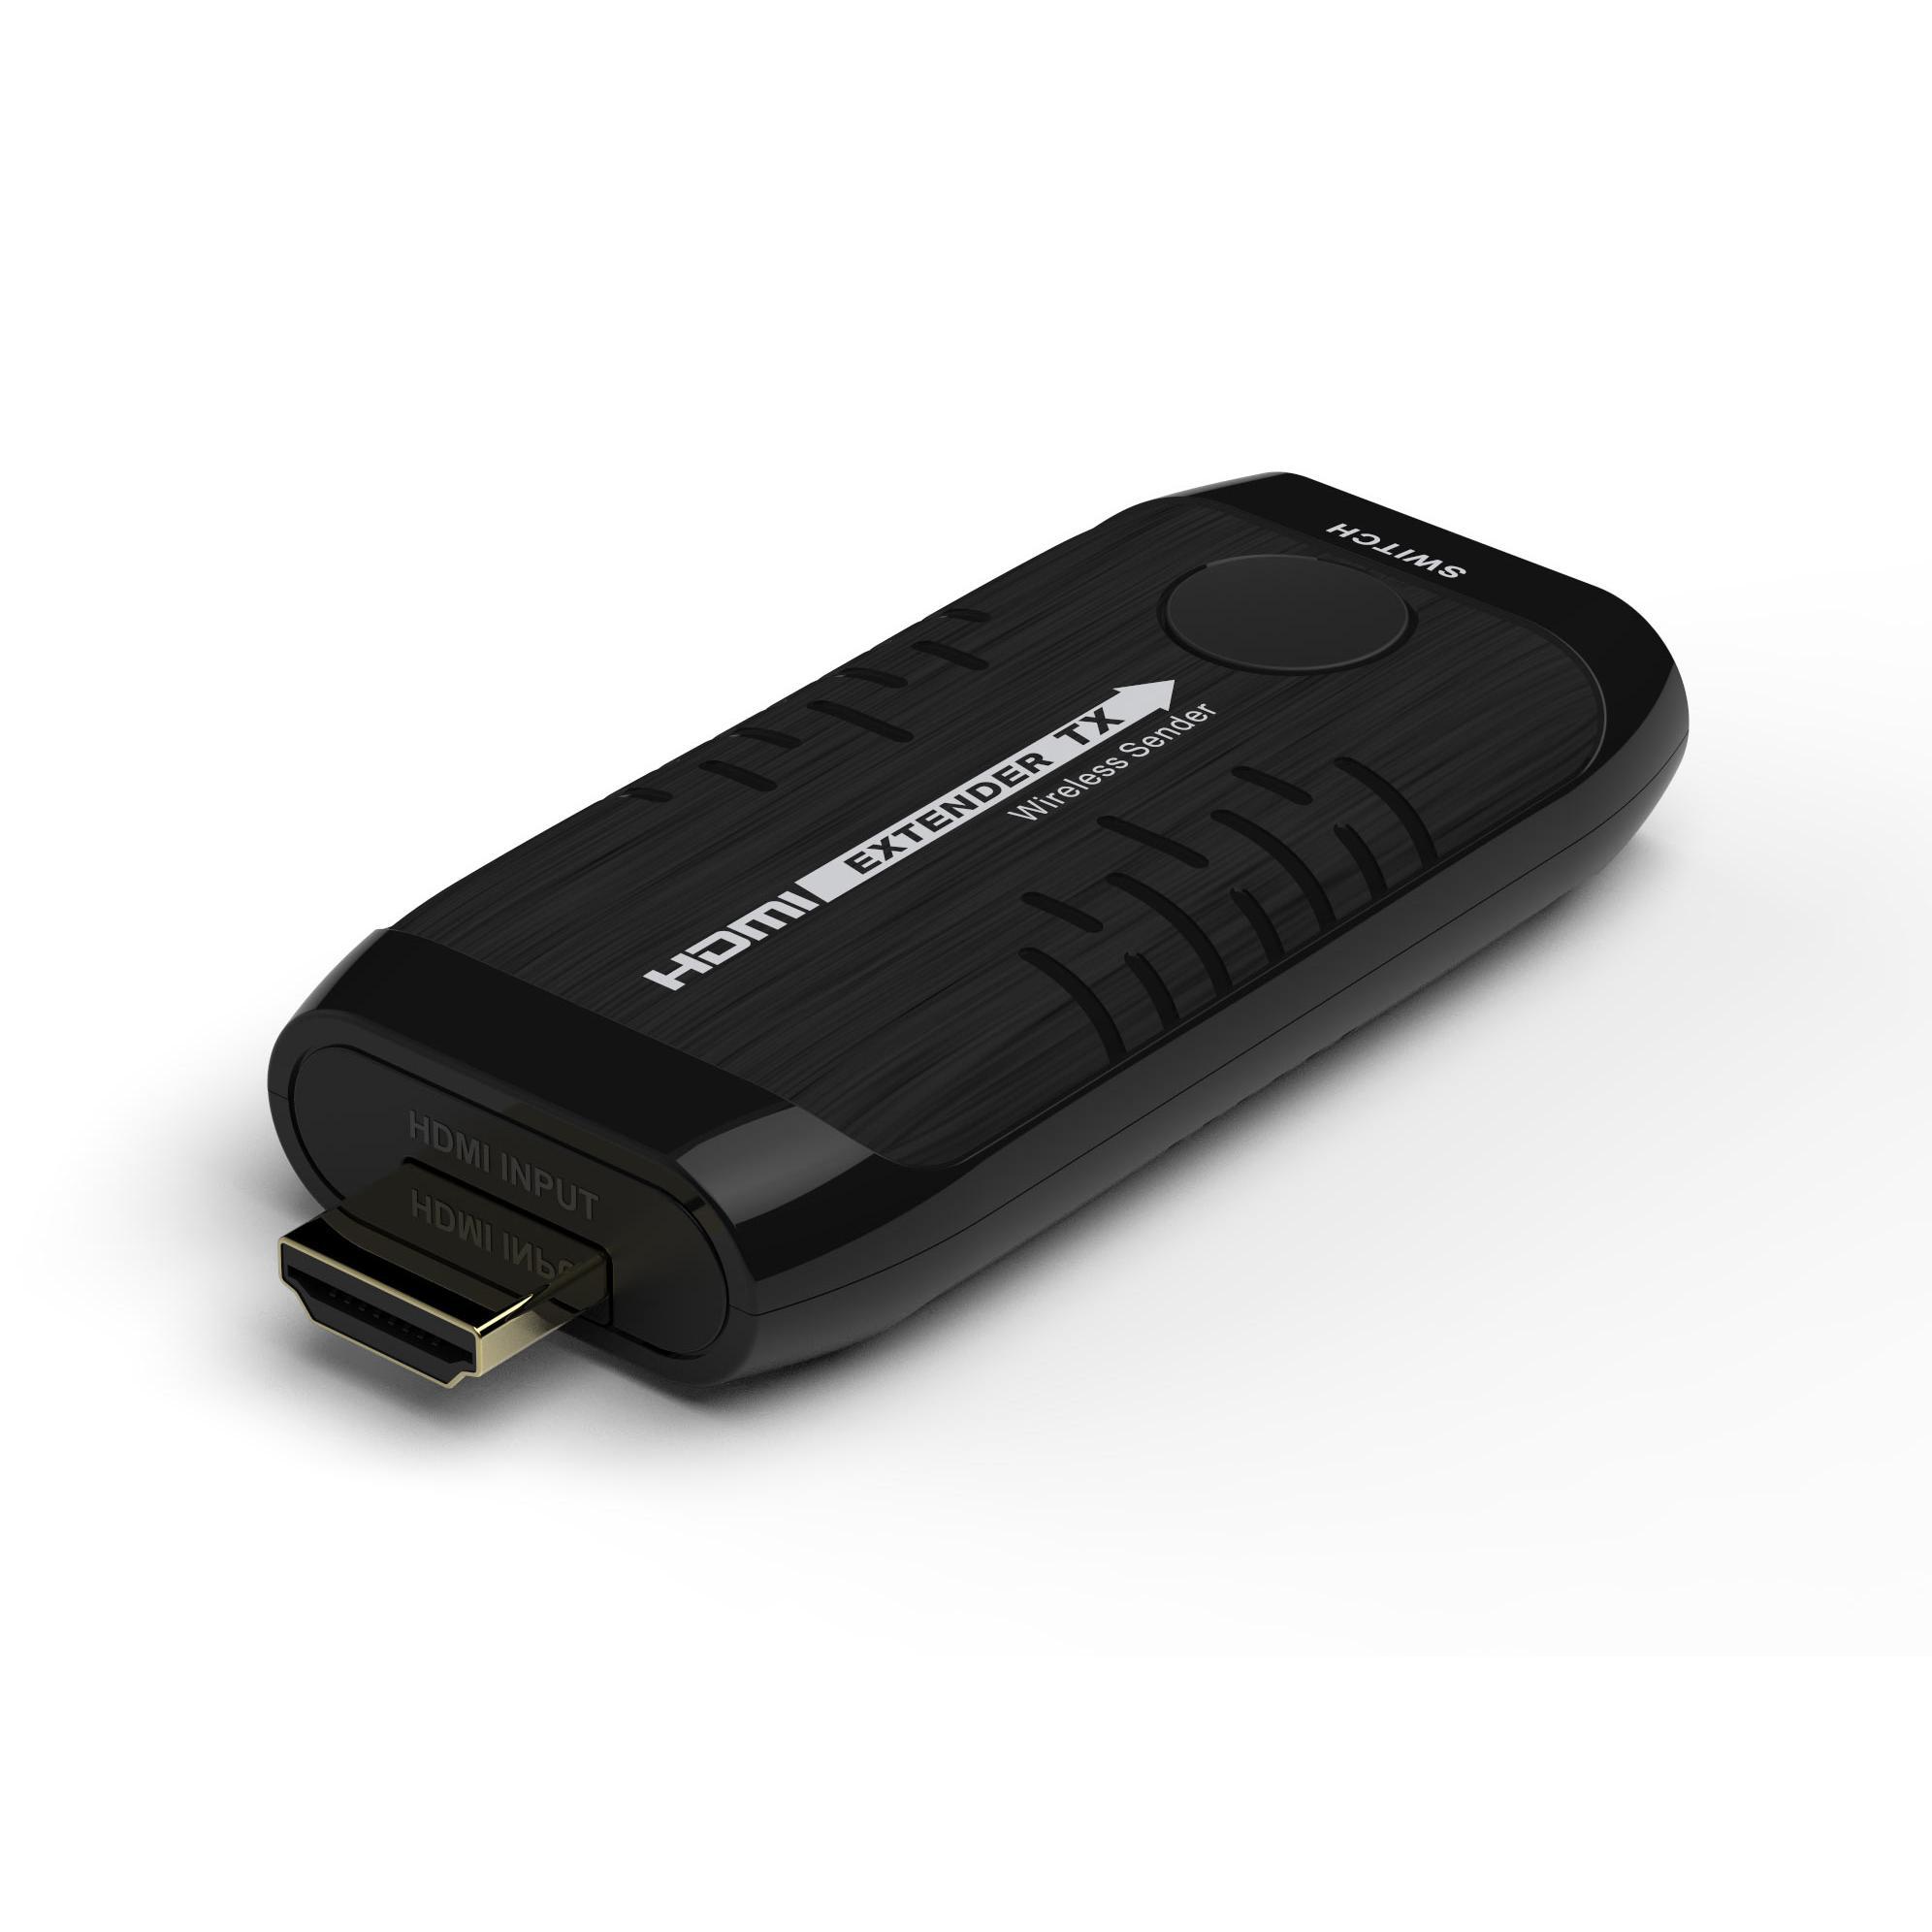 Kit Wireless HDMI Extender Full HD 20m Multi-punto